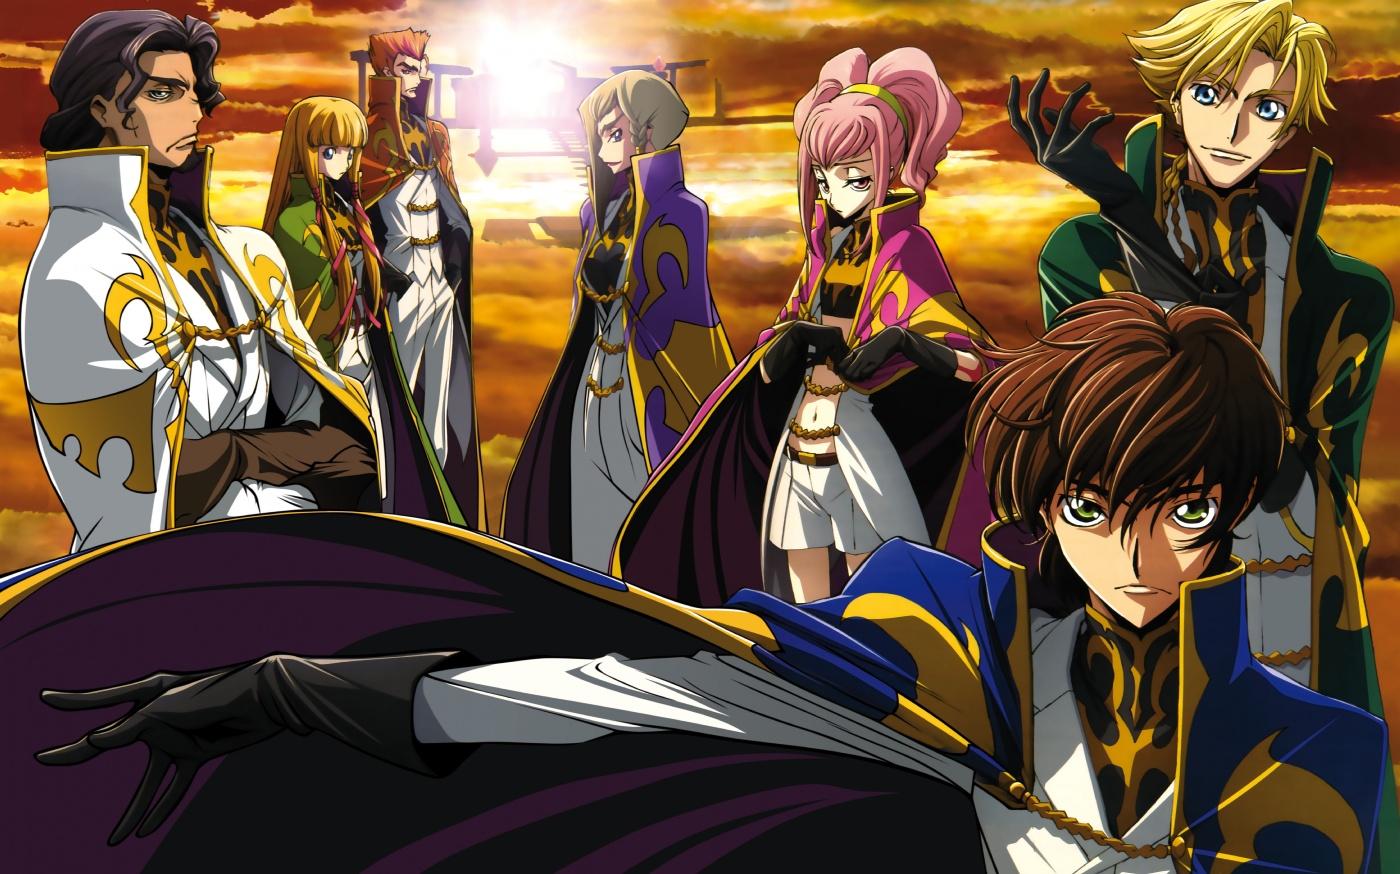 H o l y e m p for 12 knights of the round table characters